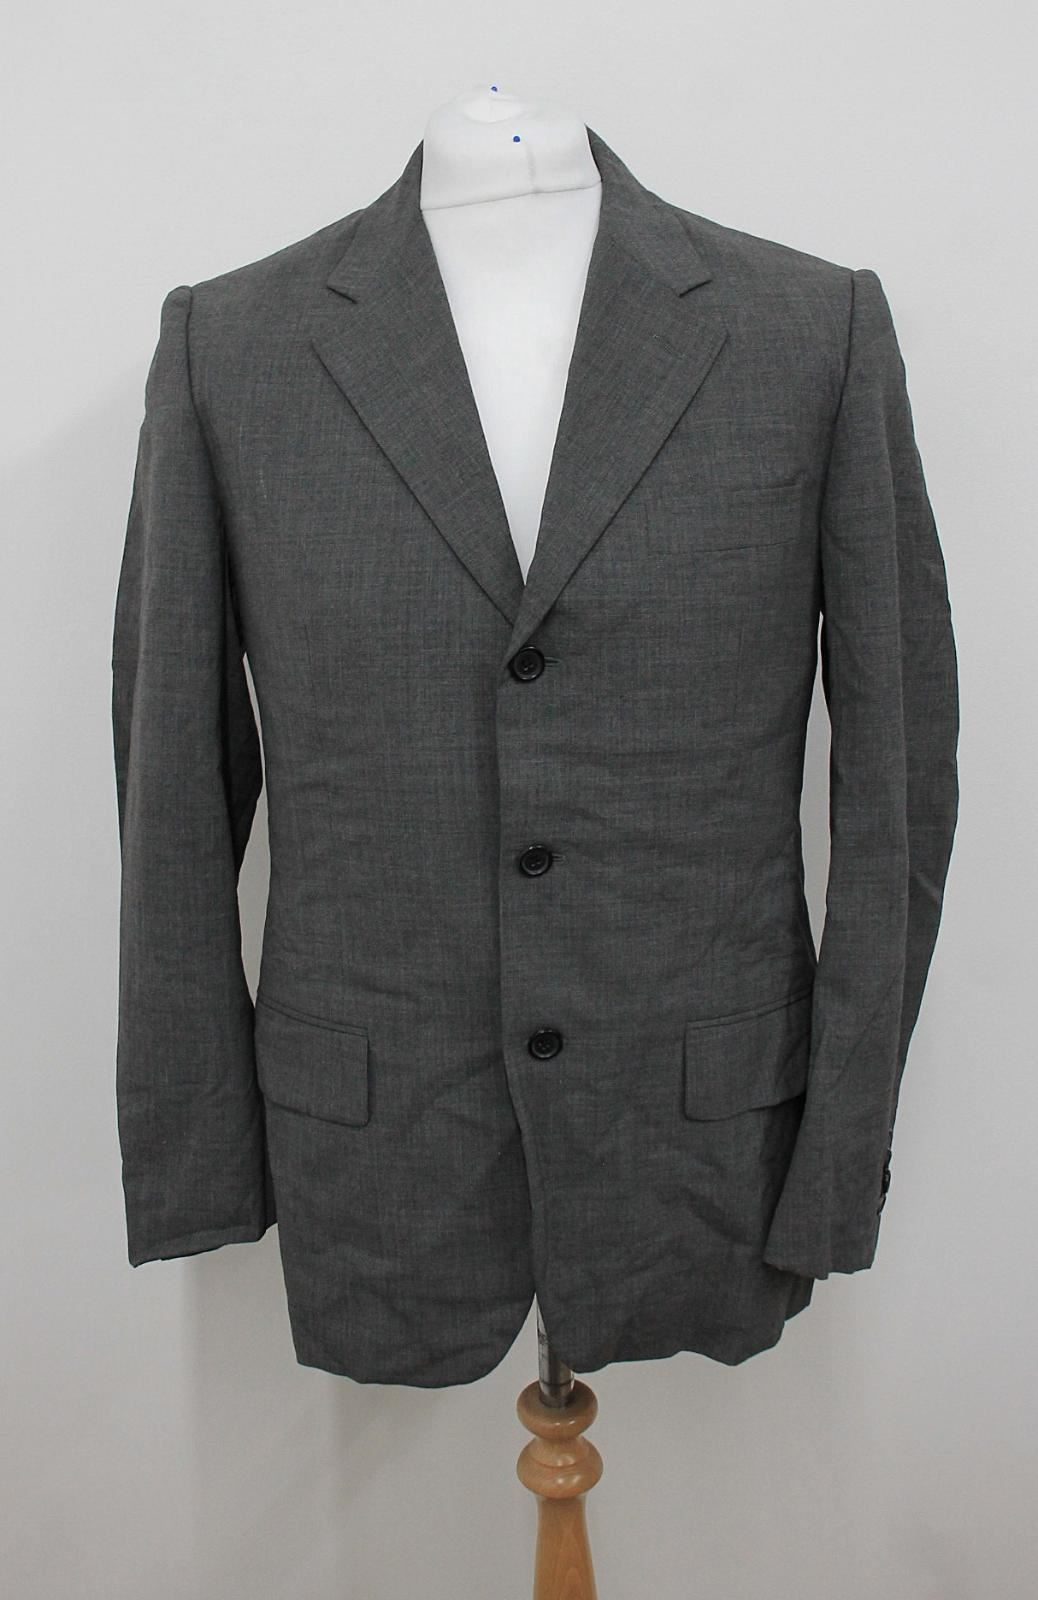 Prada Men's Light Grey Long Sleeved Single Breasted Suit Jacket It48 Uk38